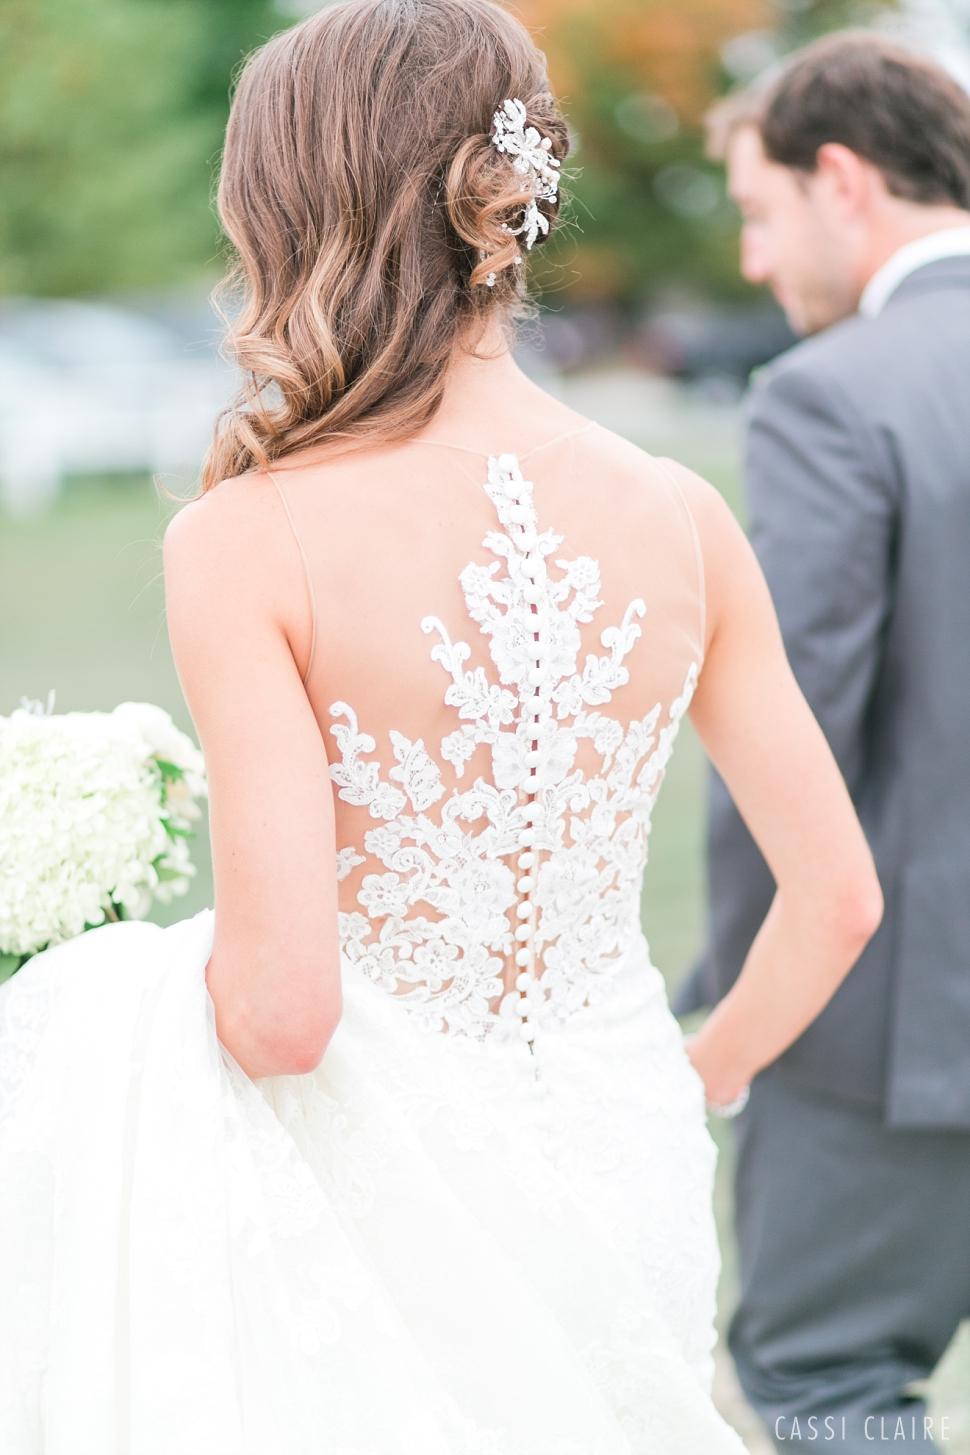 Bright-Happy-NJ-Wedding-Photographer-CassiClaire_66.jpg